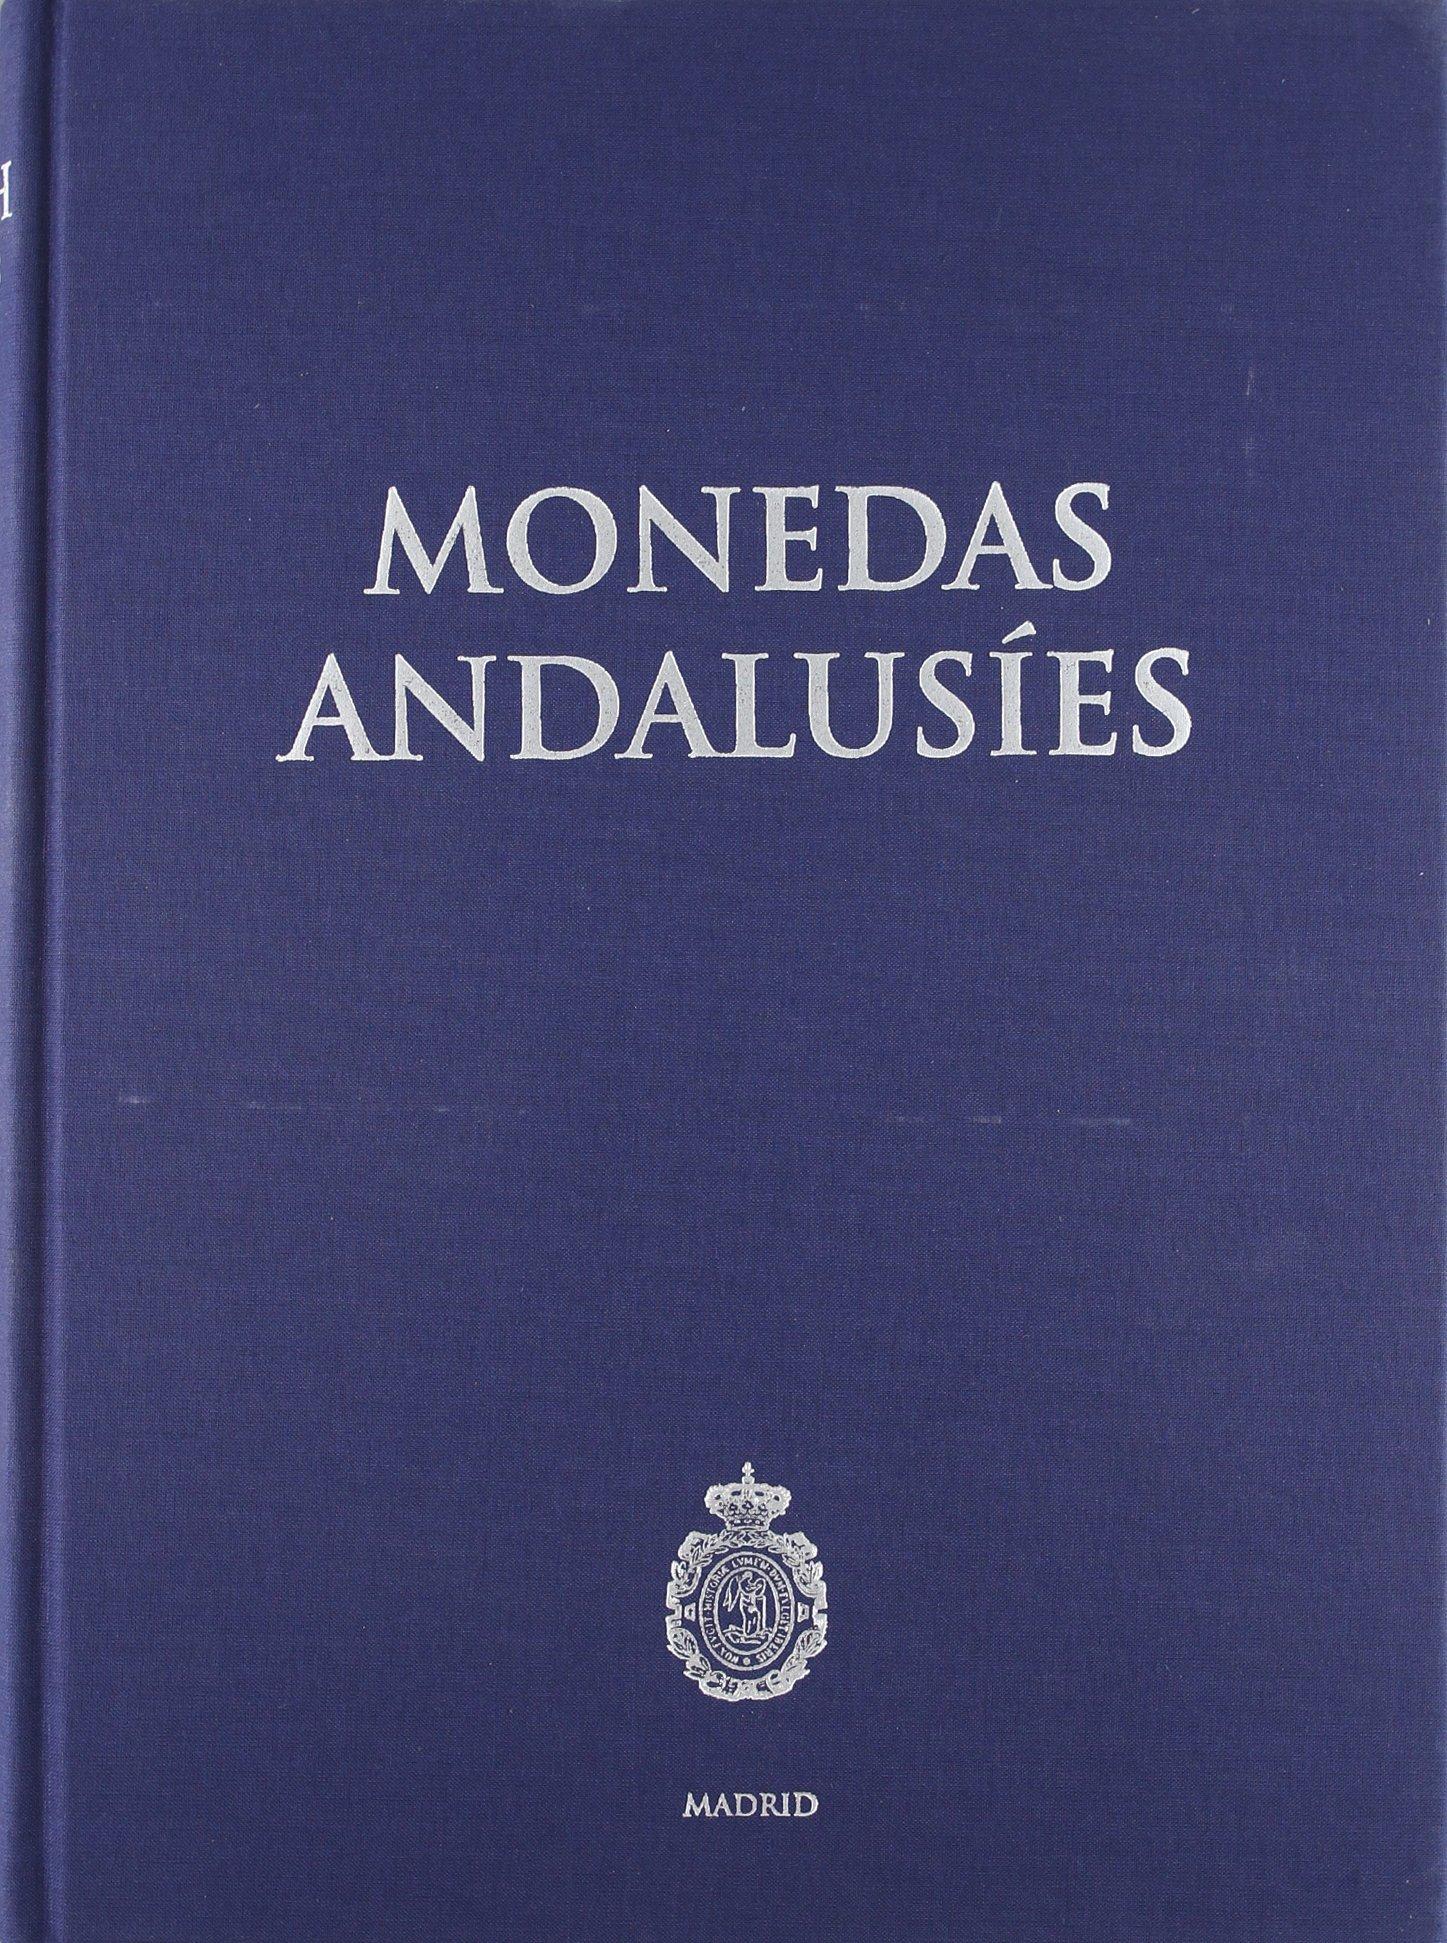 Monedas Andalusíes. Catálogos. II. Monedas y Medallas.: Amazon.es: Canto García, Albert, Martín Escudero, Fátima, Tawfiq ibn Hafiz, Ibrahim: Libros